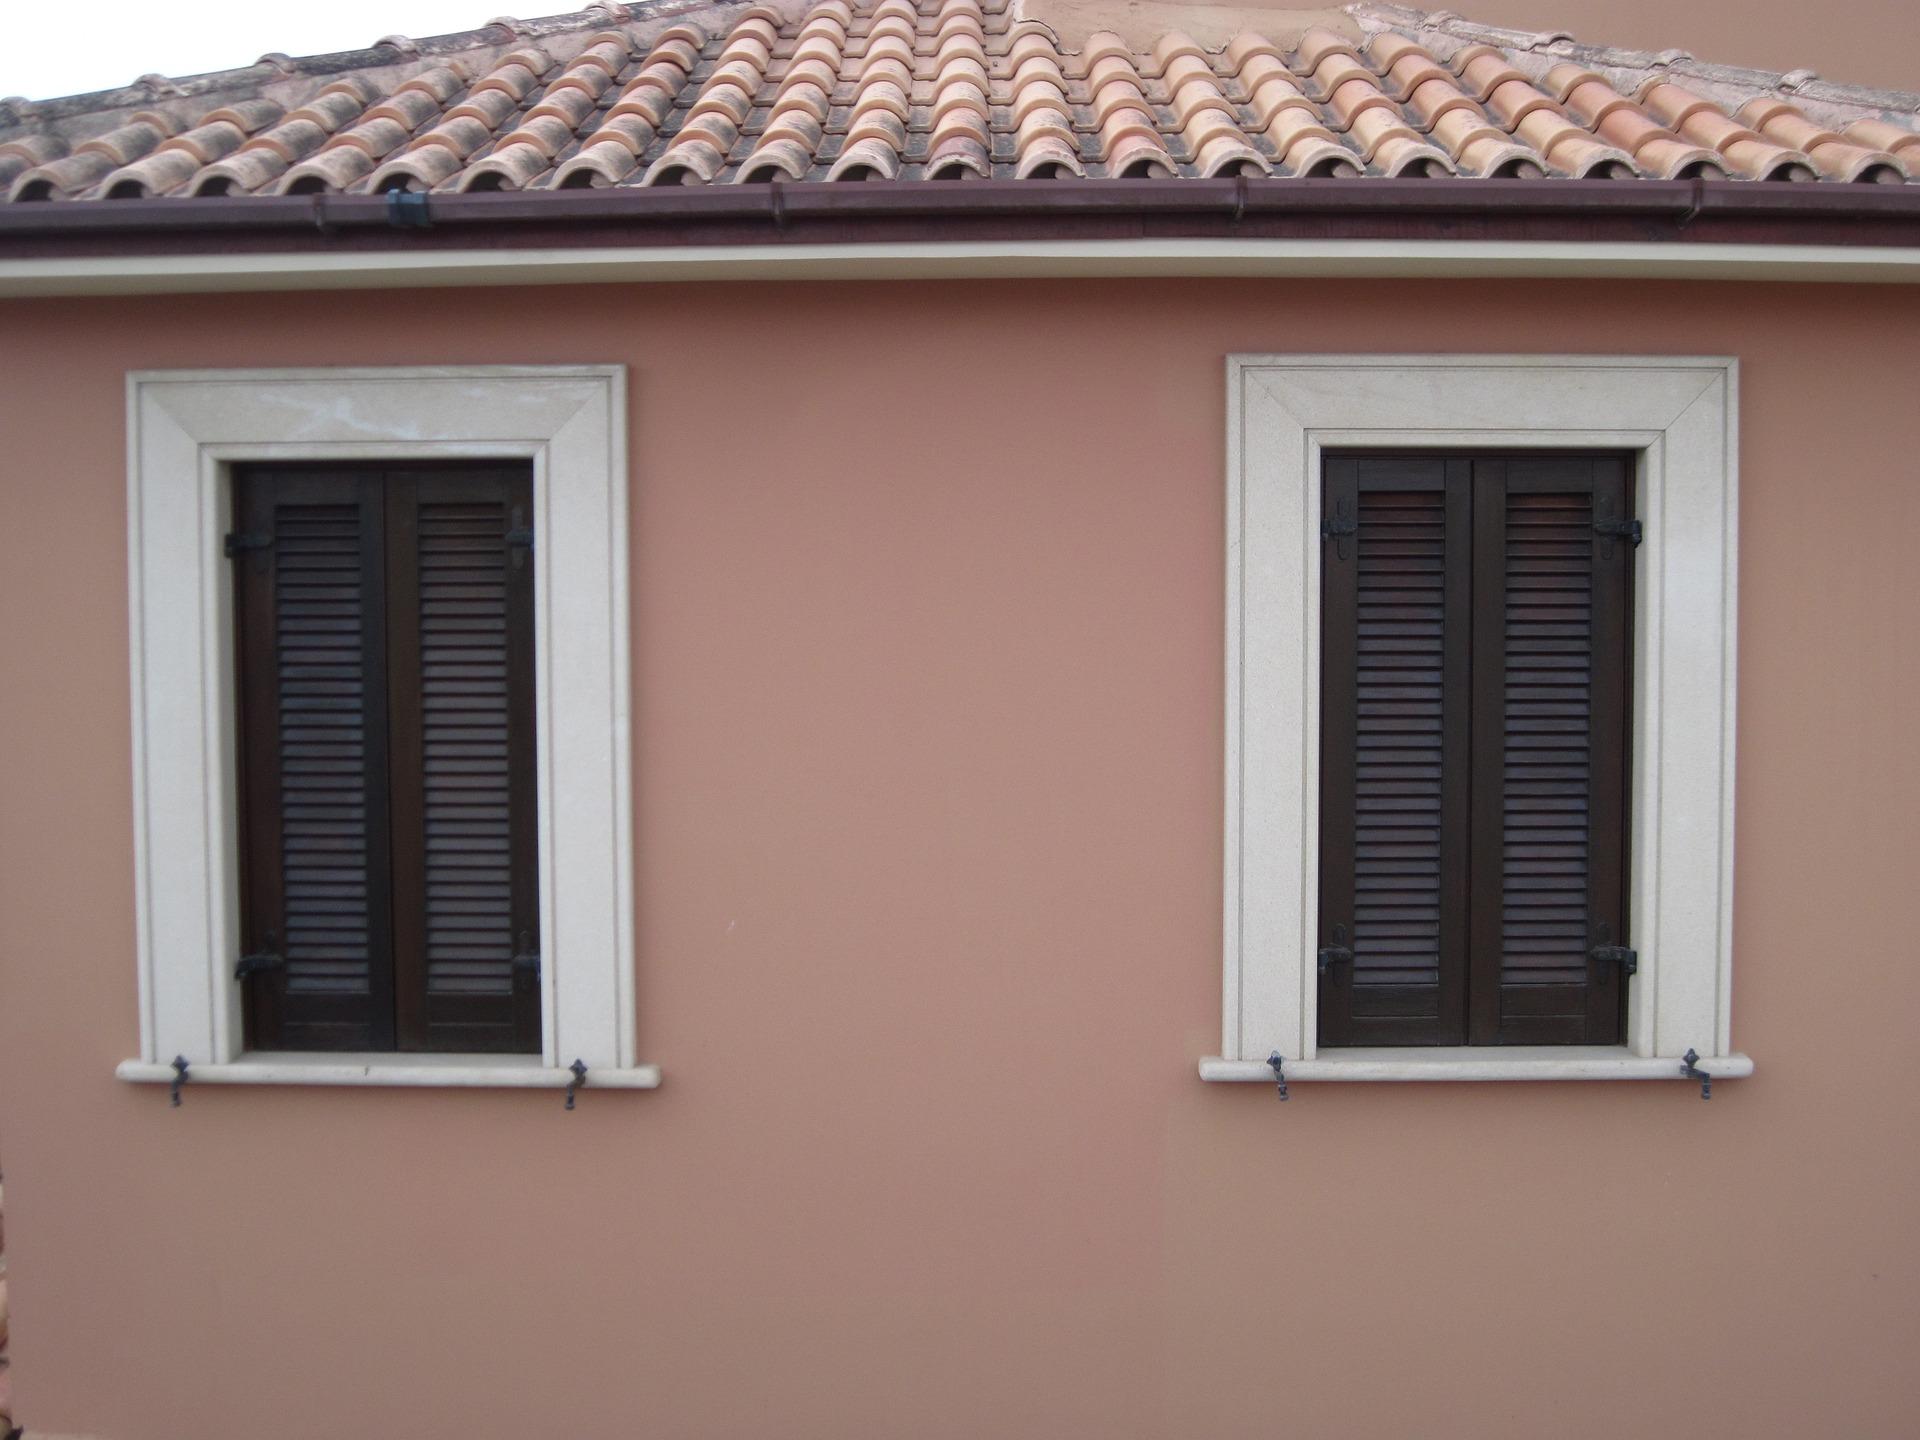 house-2137250_1920